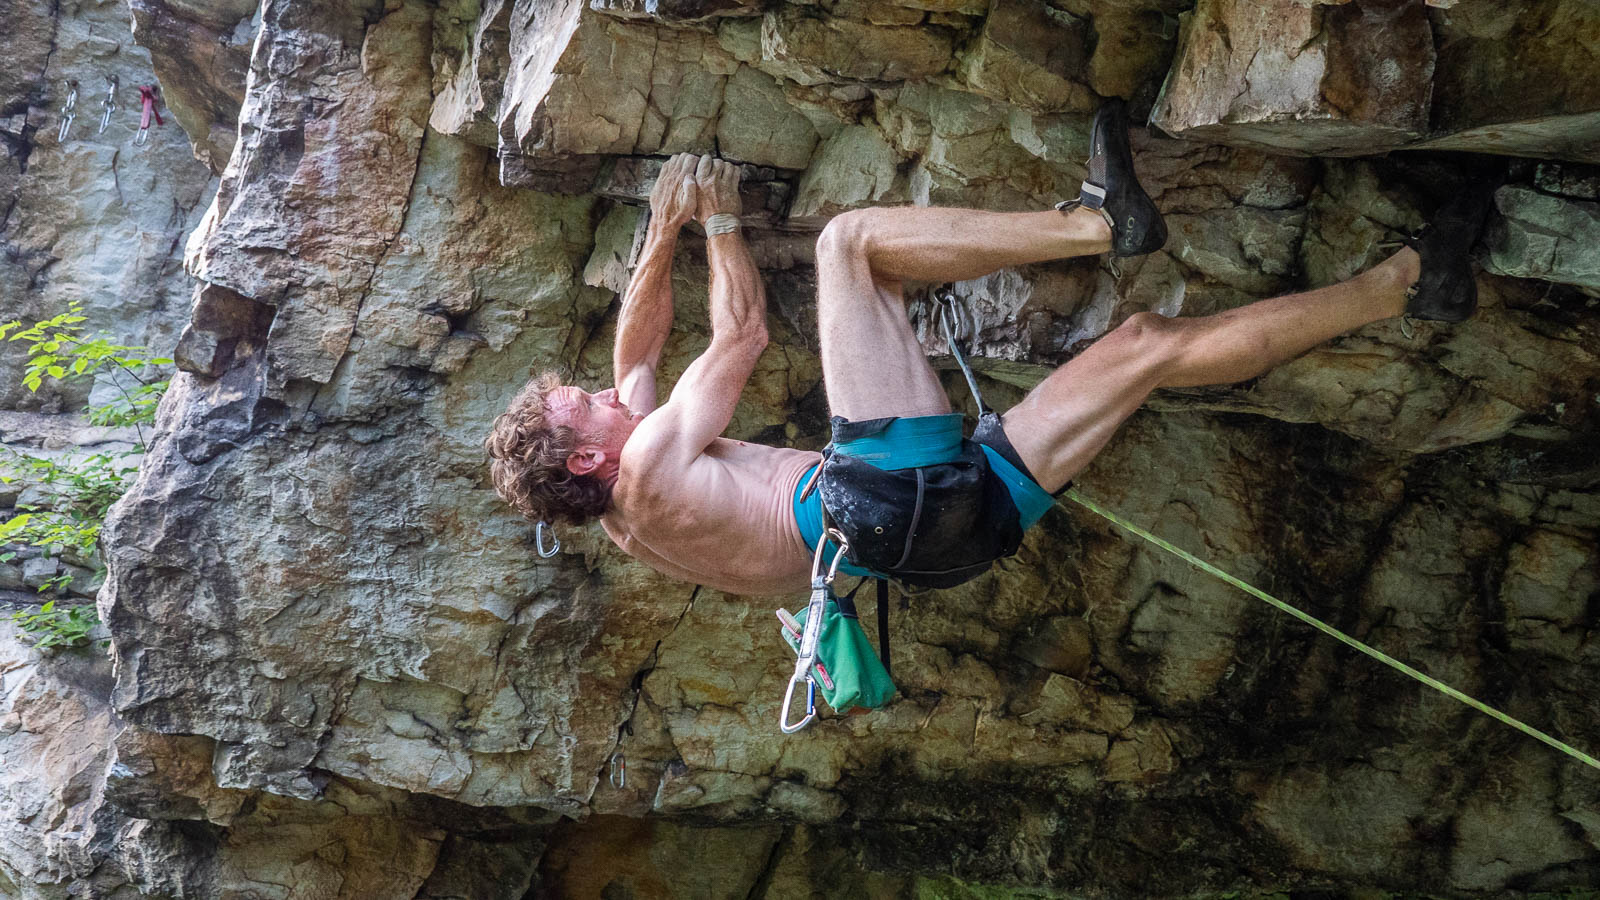 Flyin' Lion - Matt Fanning Exiting The Cave